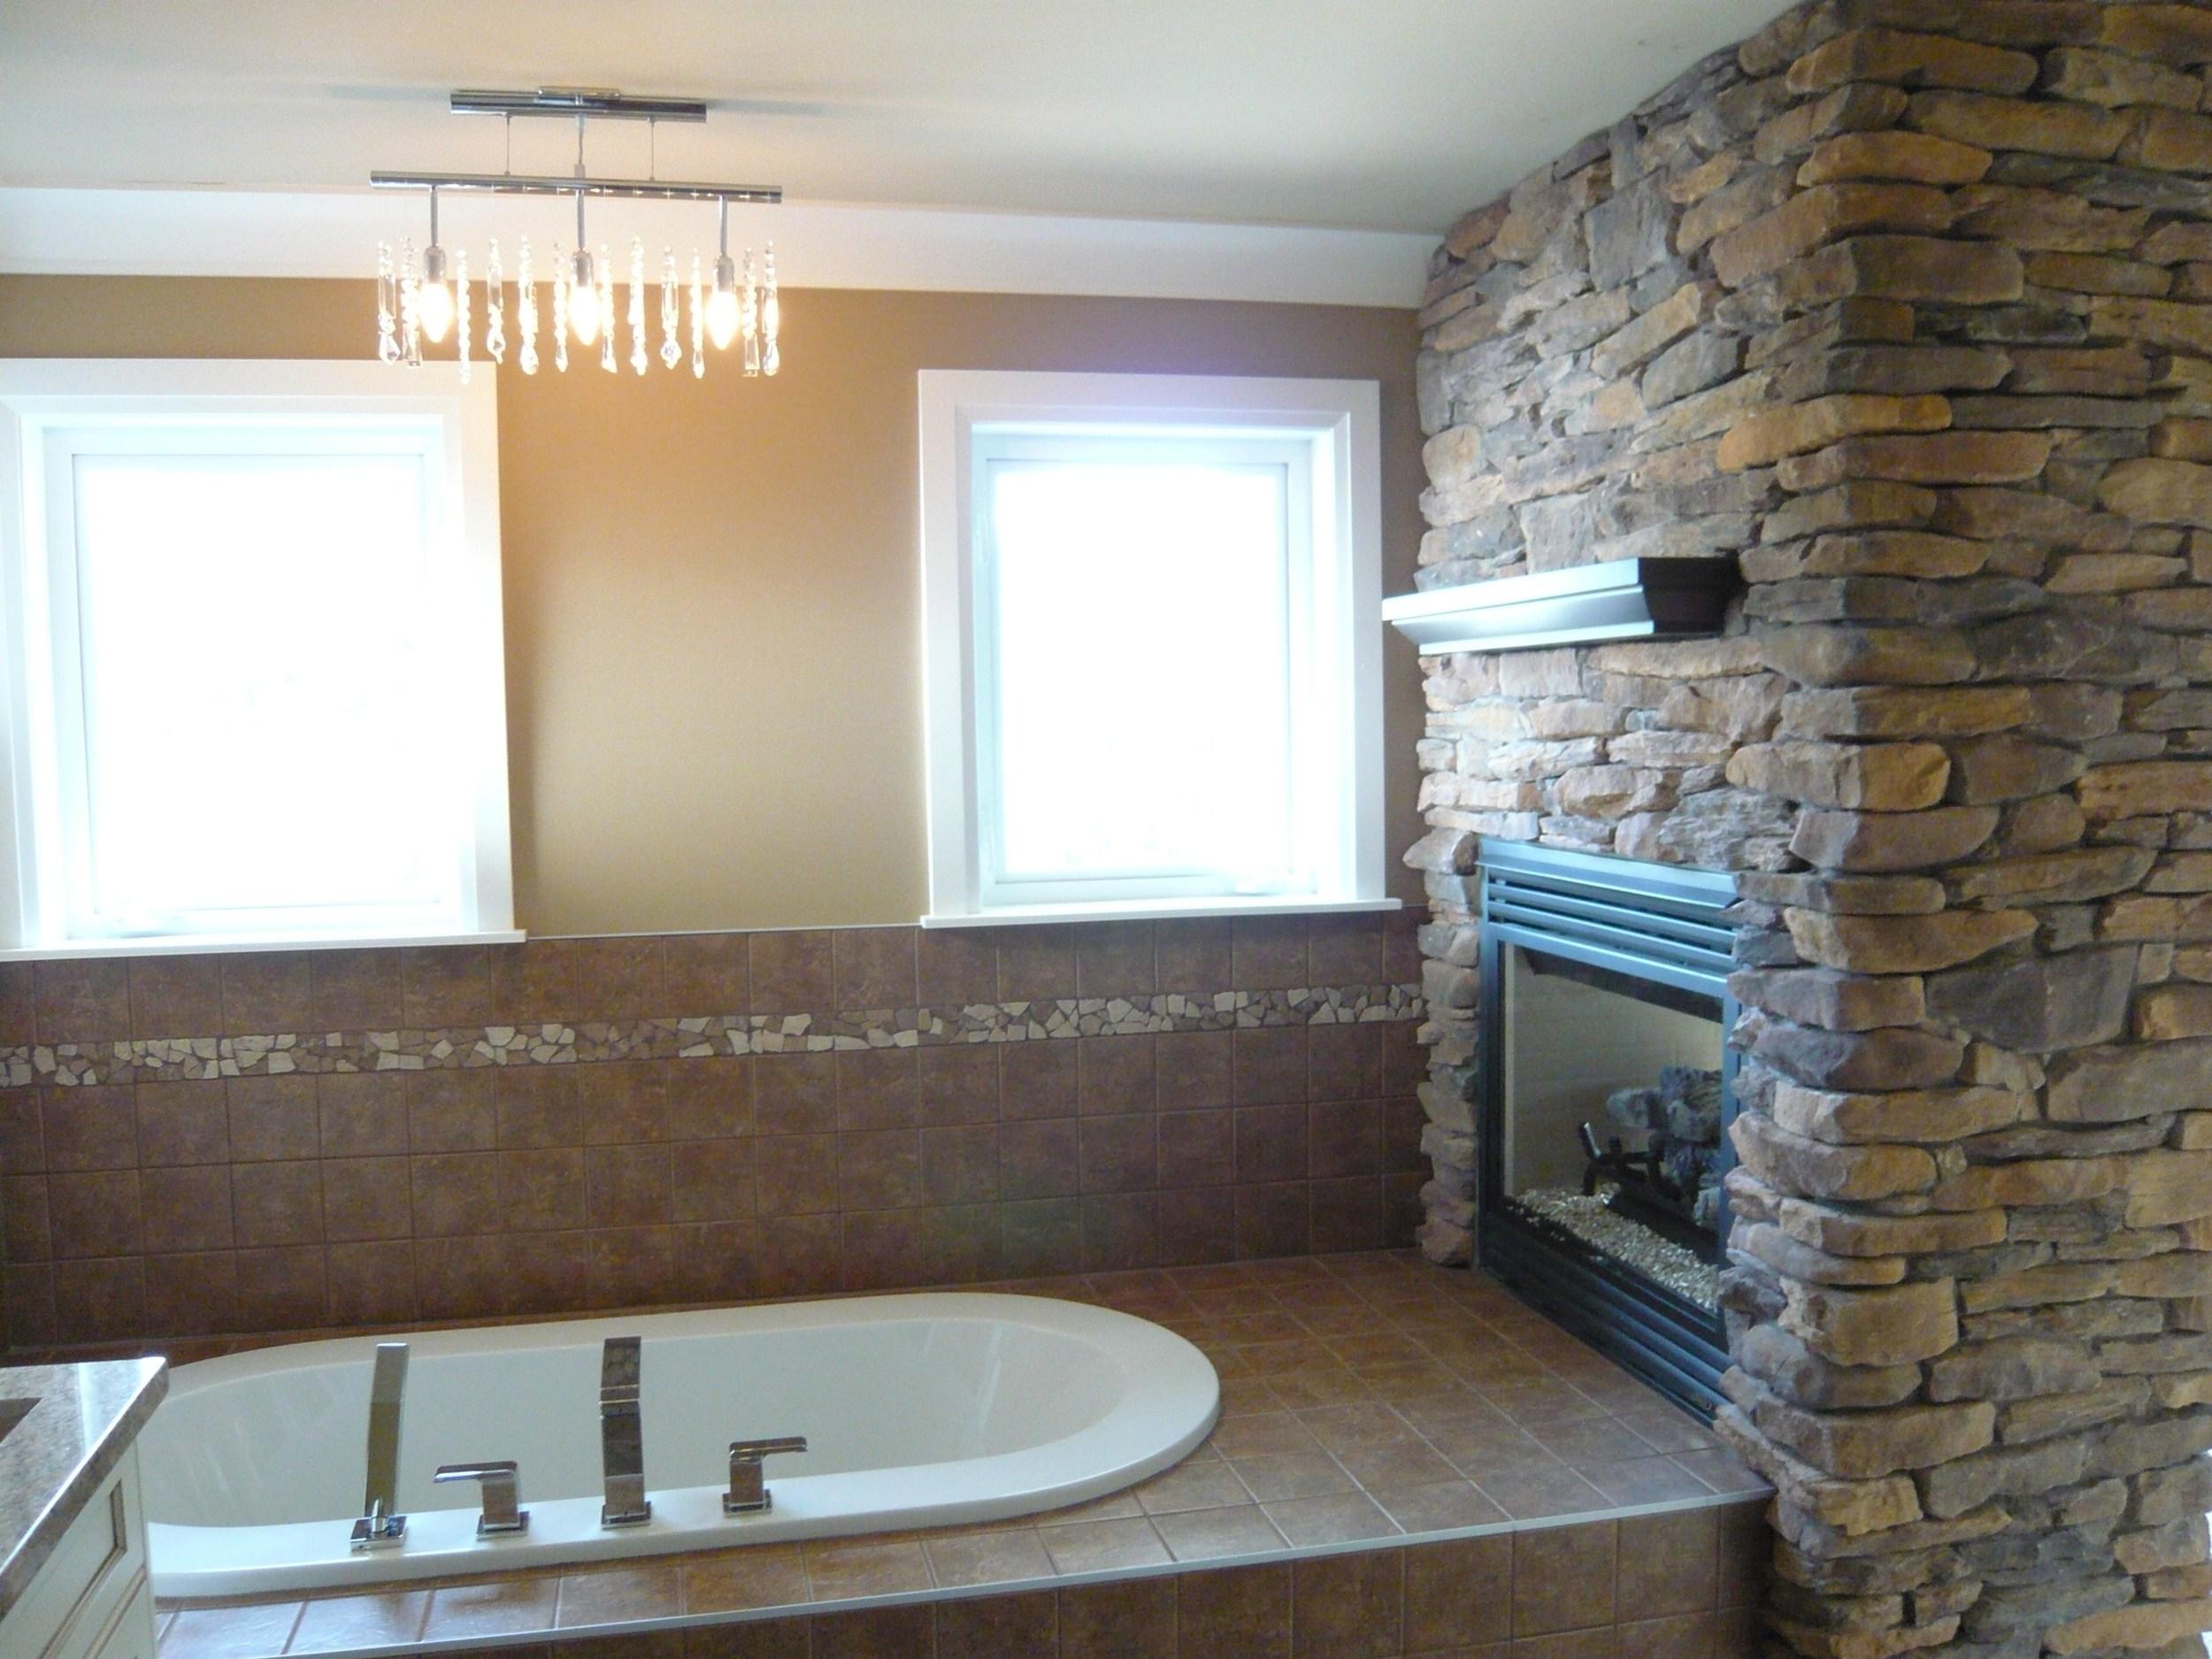 Soaker Tub Fireplace